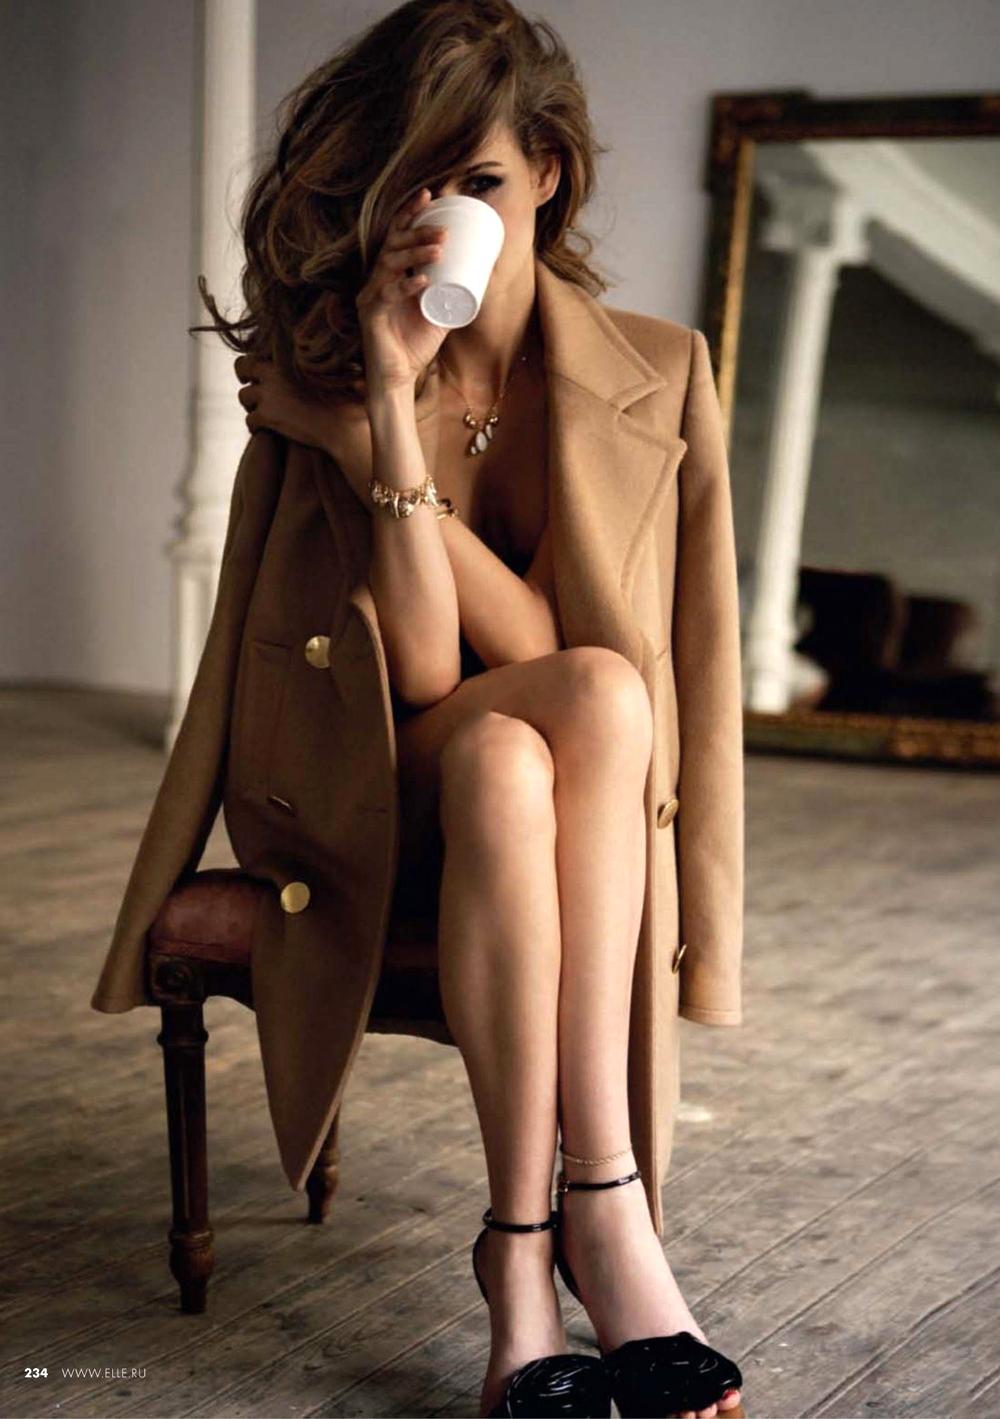 Belle de Jour / Elle Russia November 2009 (photography: Mario Sierra, styling: Immaculada Jimenez, model: Flavia de Oliveira)